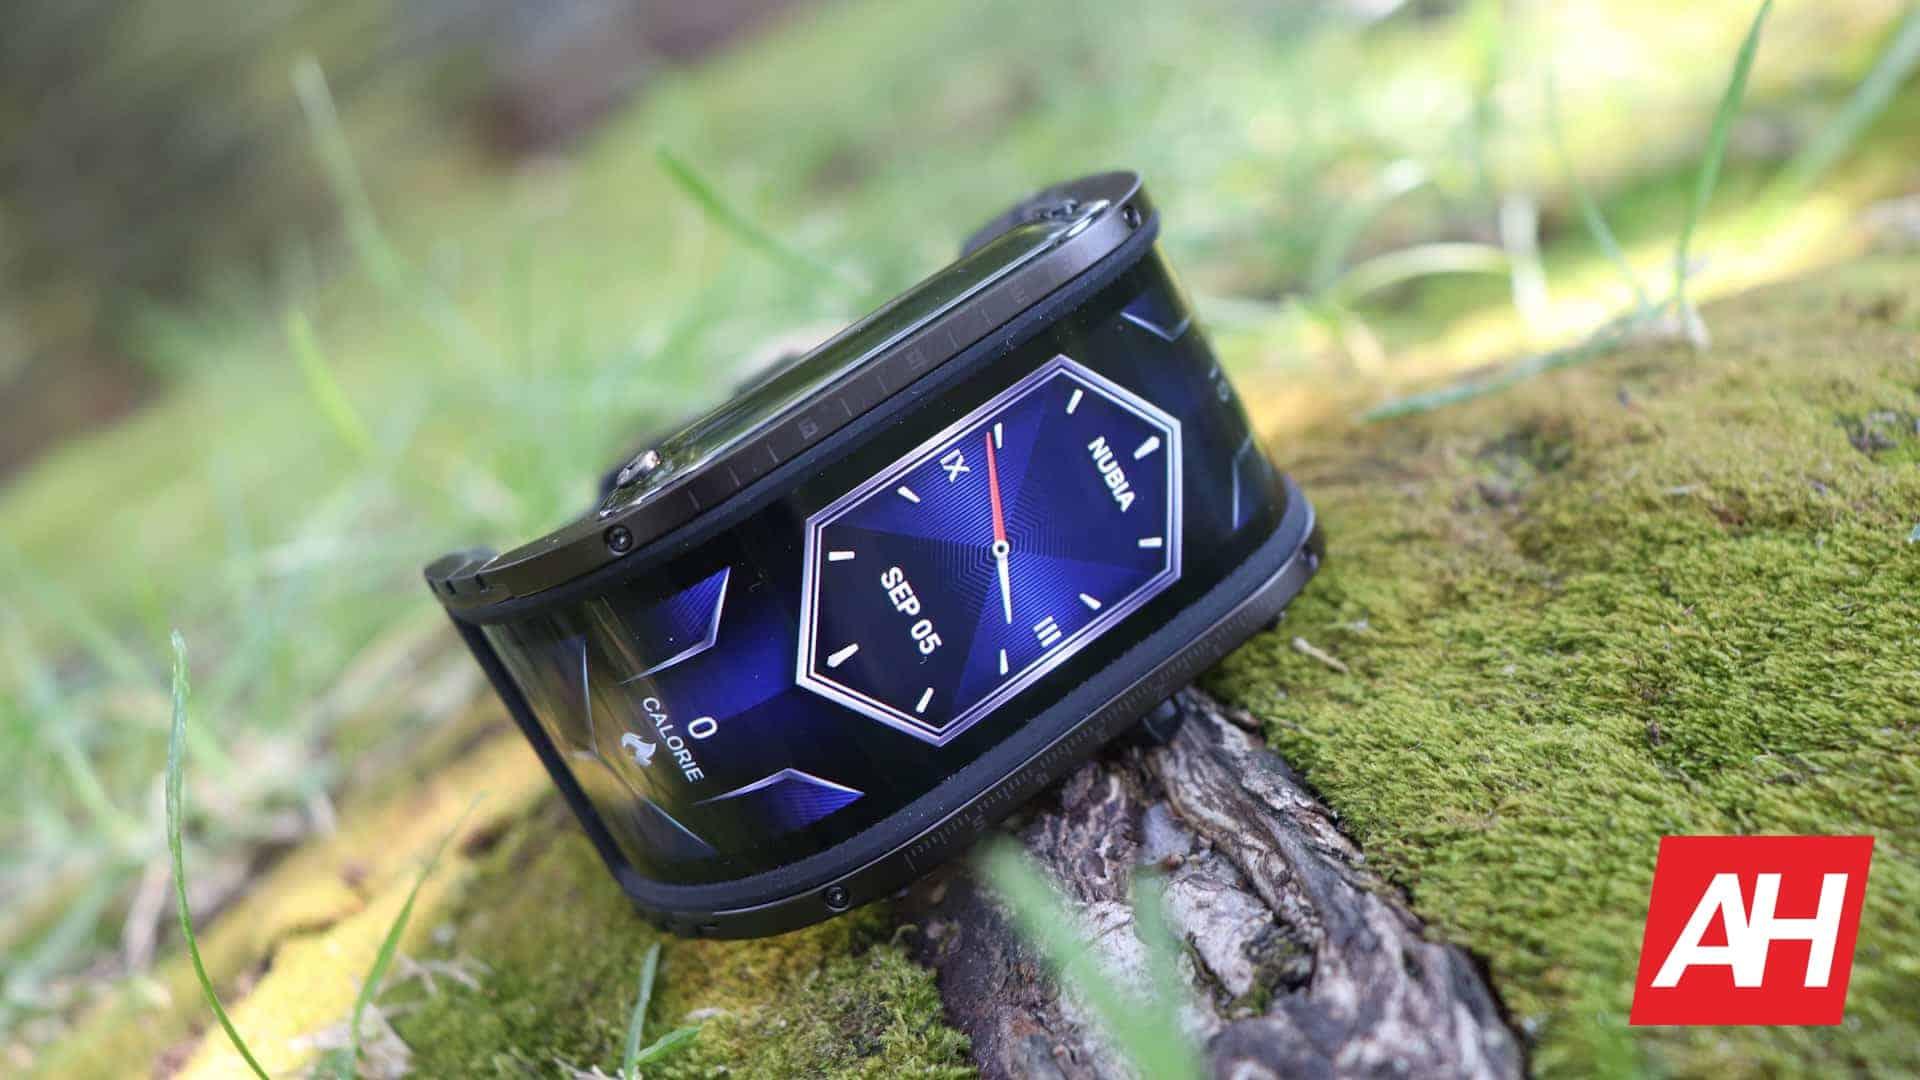 01 0 Nubia Watch Review Hardware DG AH 2020